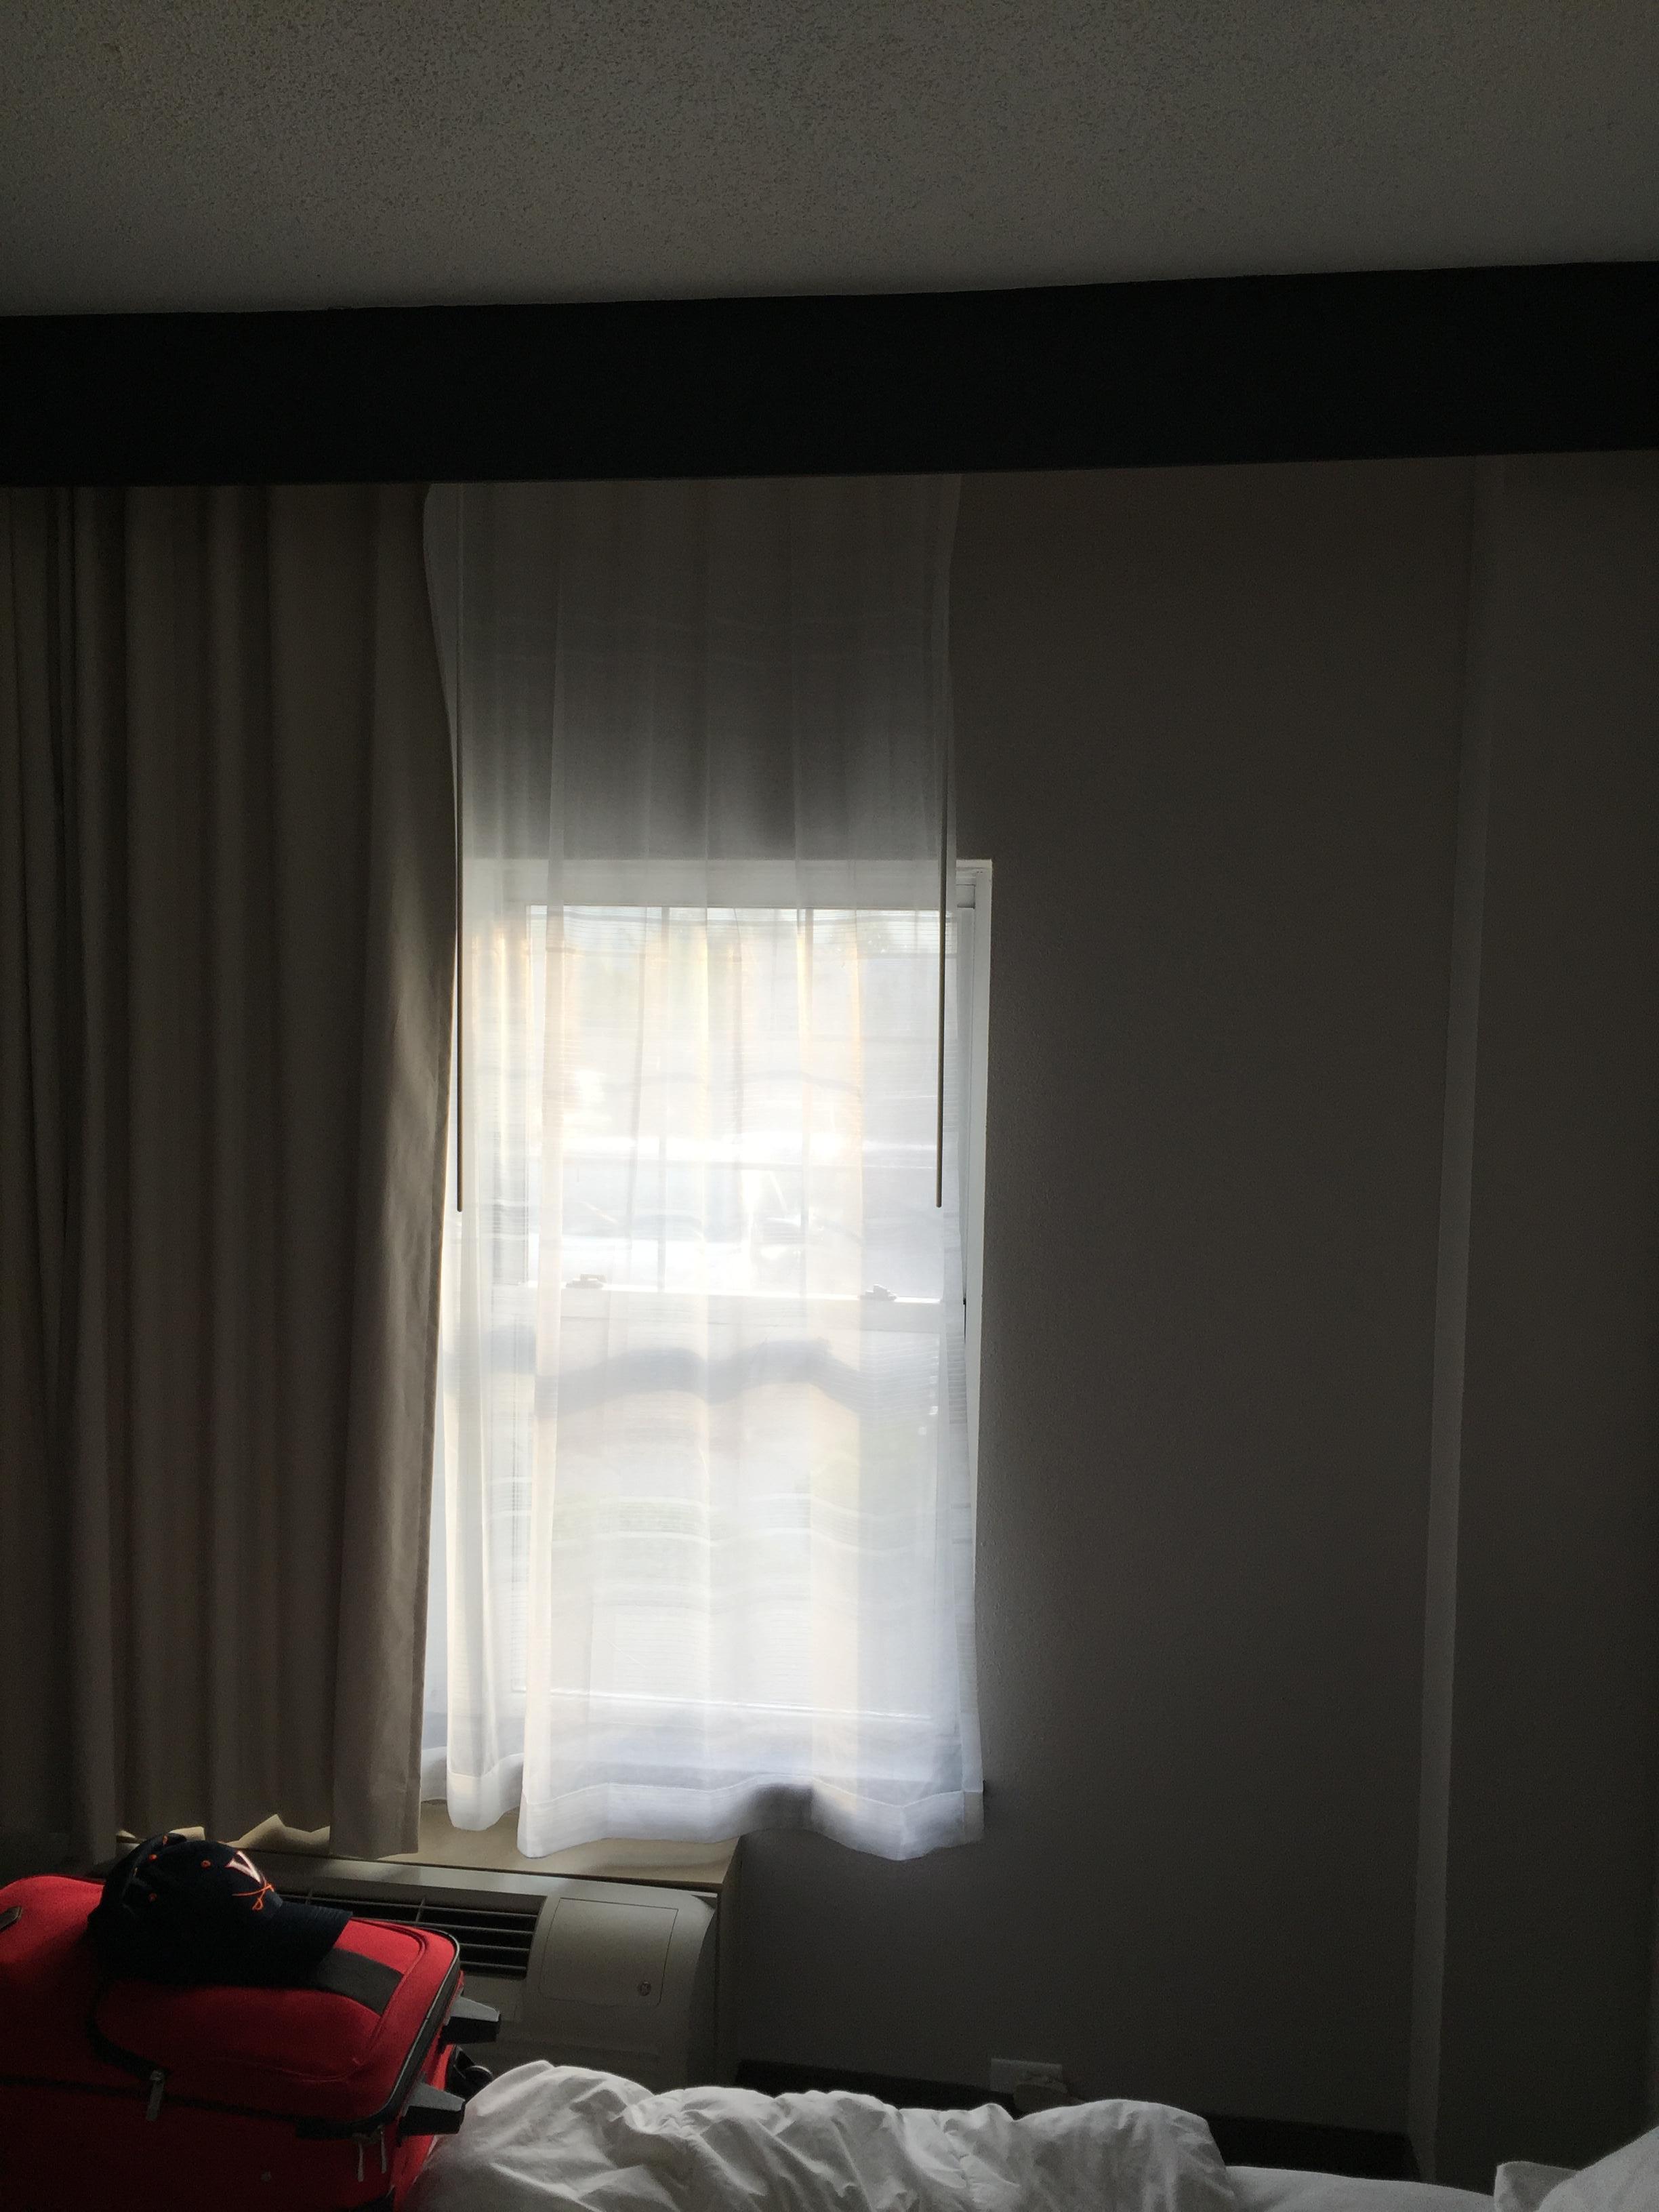 Full shot of window.